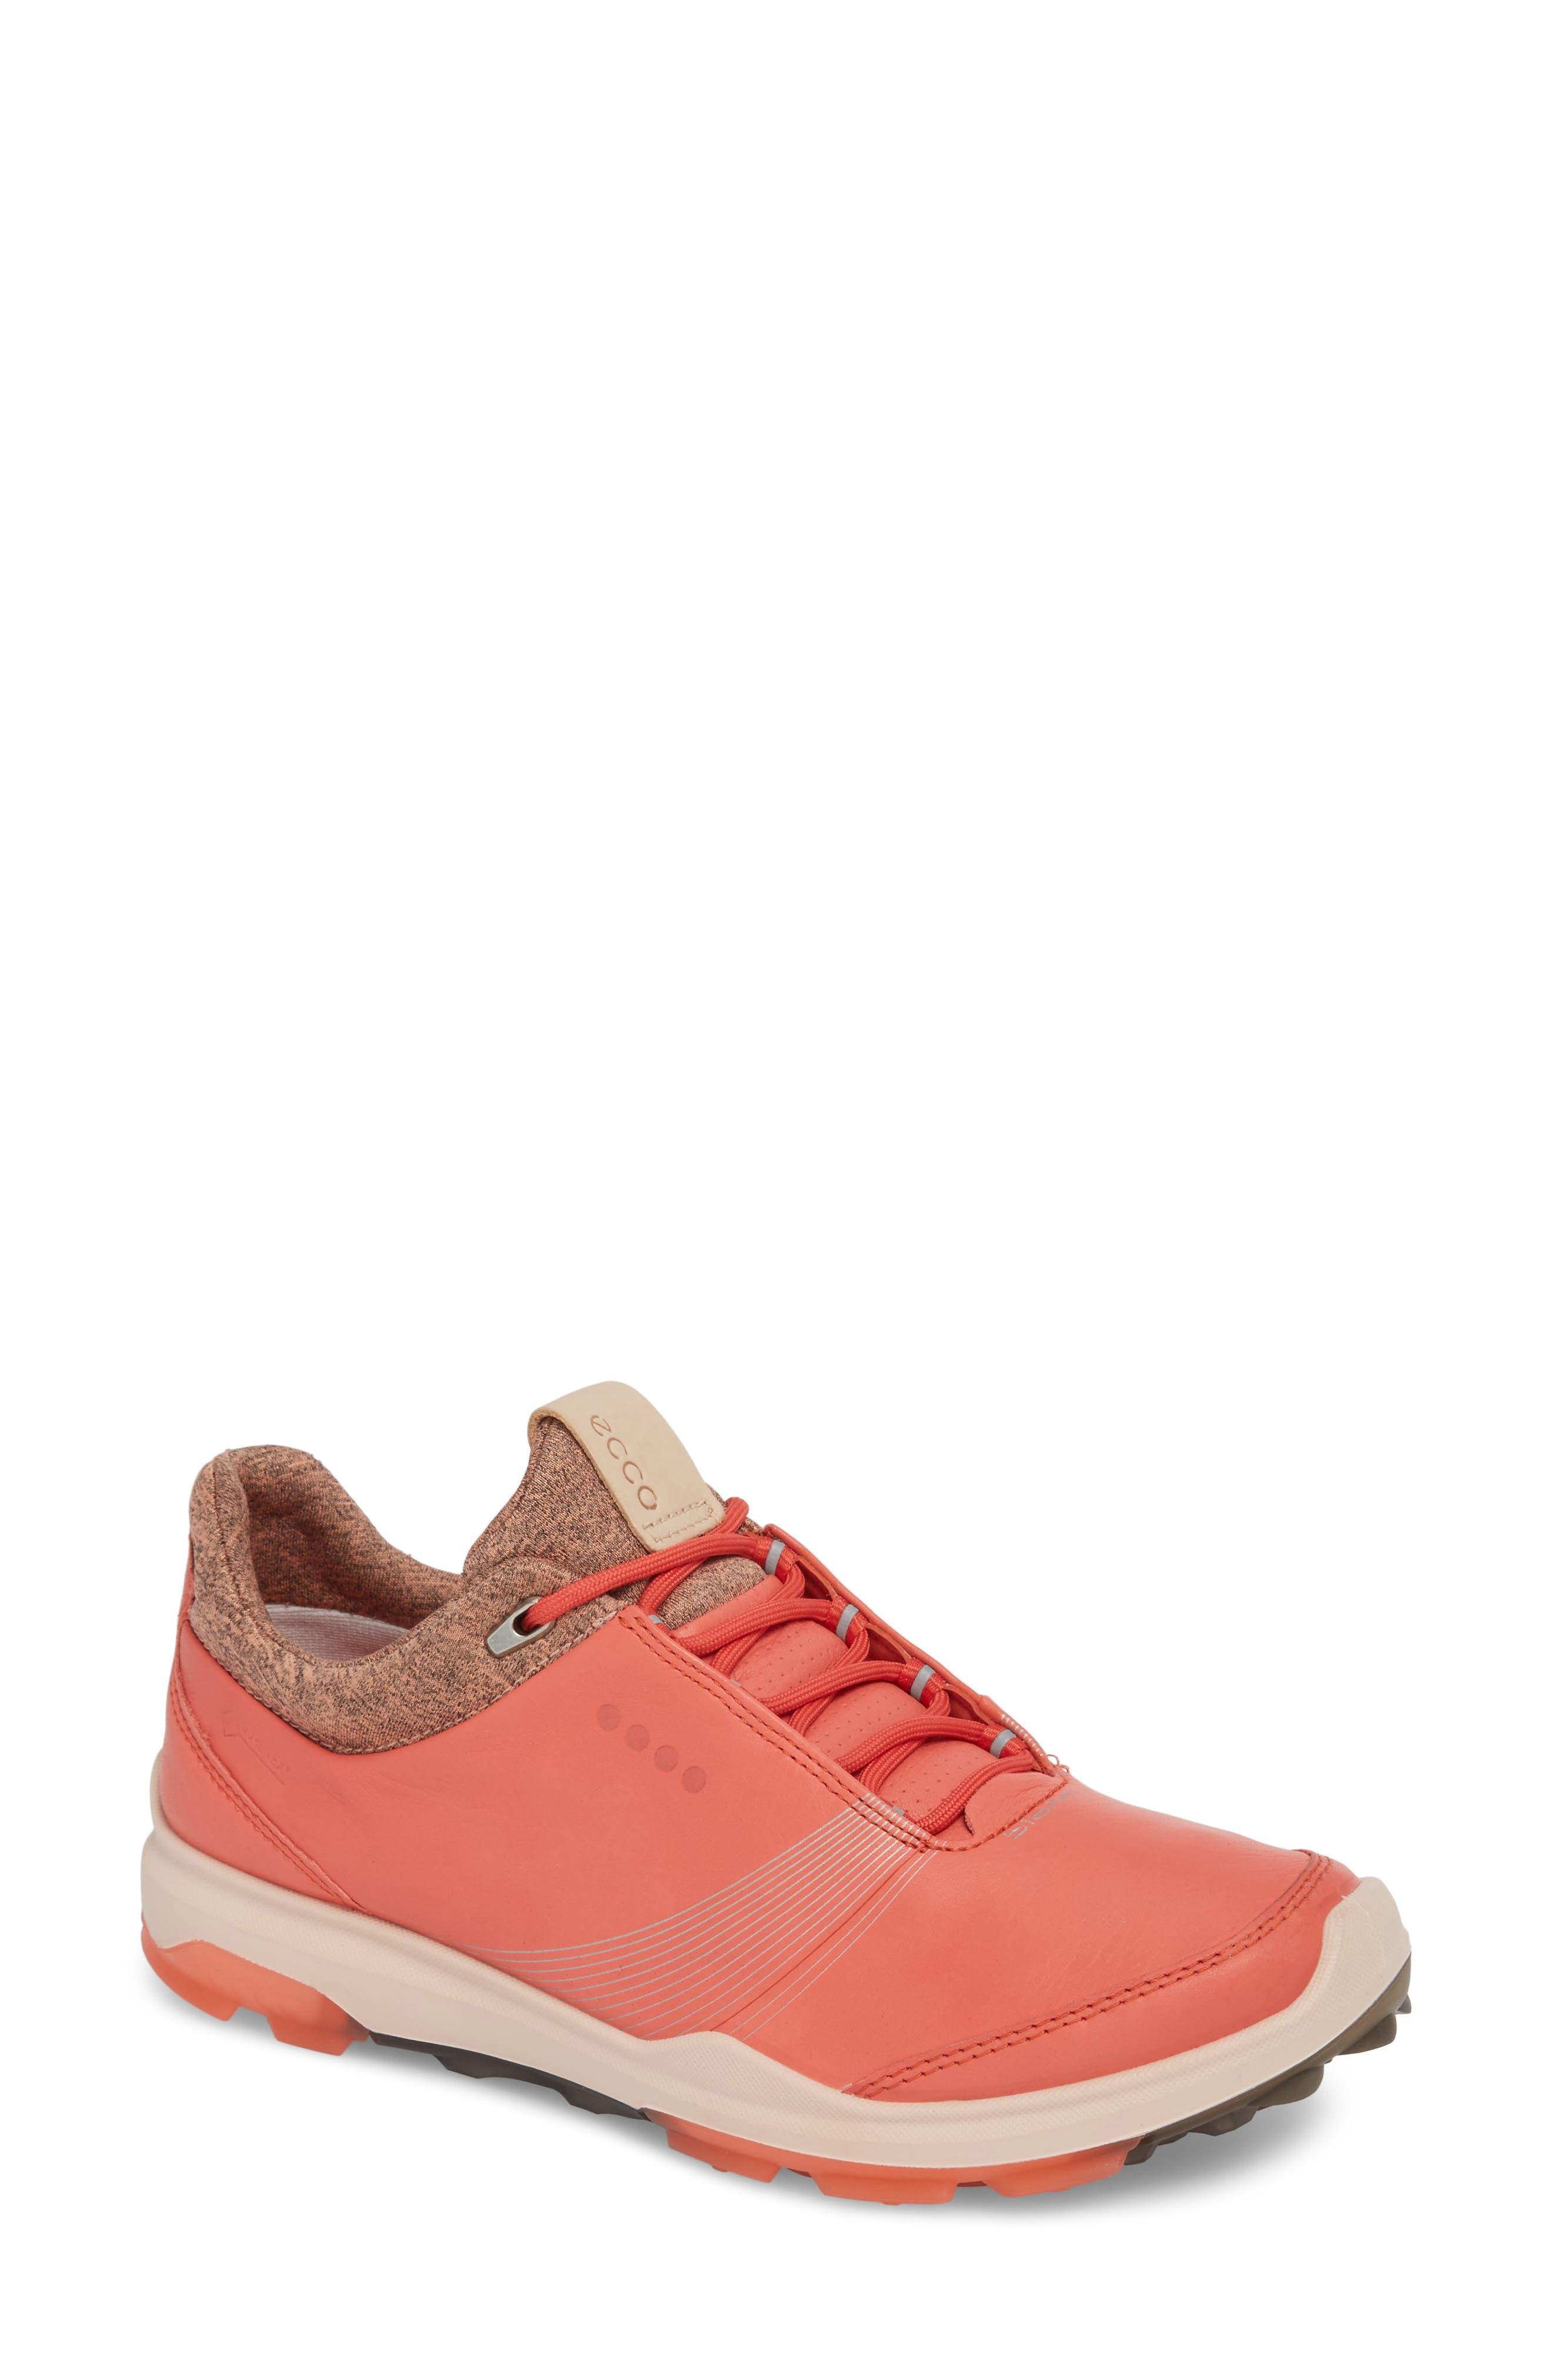 Ecco Biom Hybrid 3 Gtx Golf Shoe, Pink